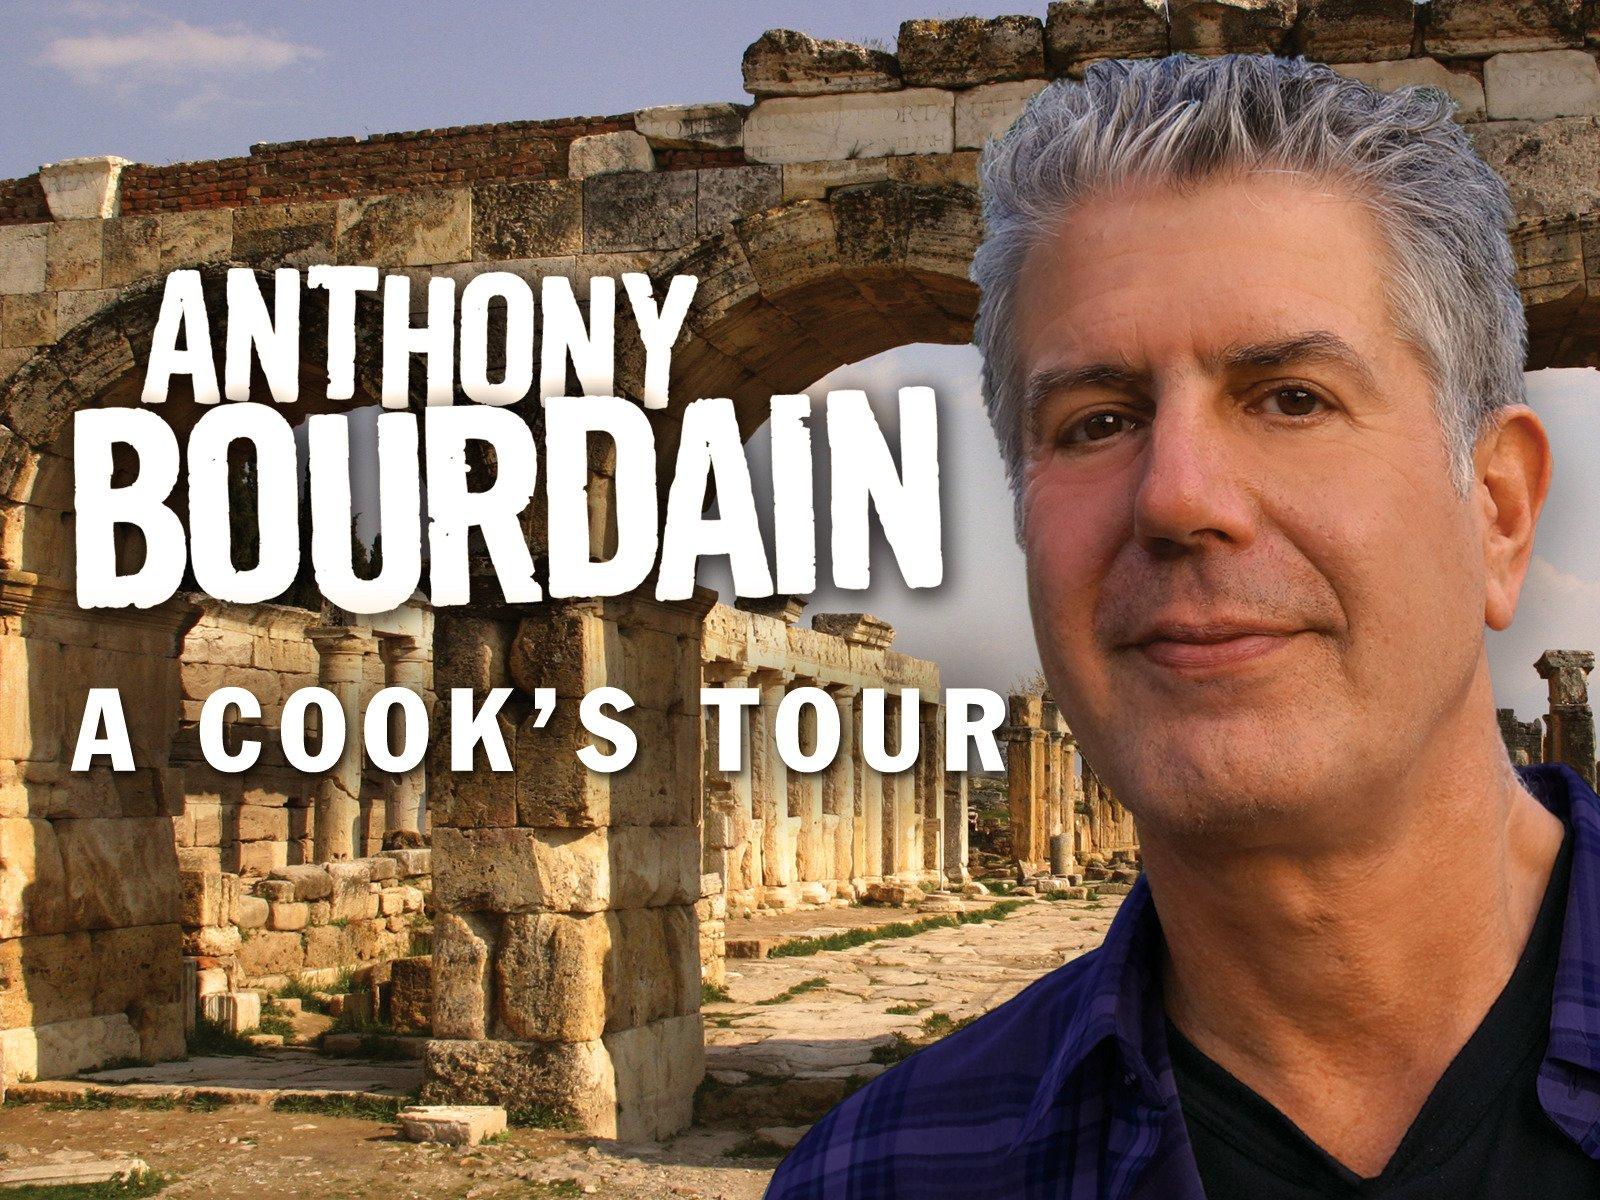 Anthony Bourdain's A Cook's Tour - Season 1